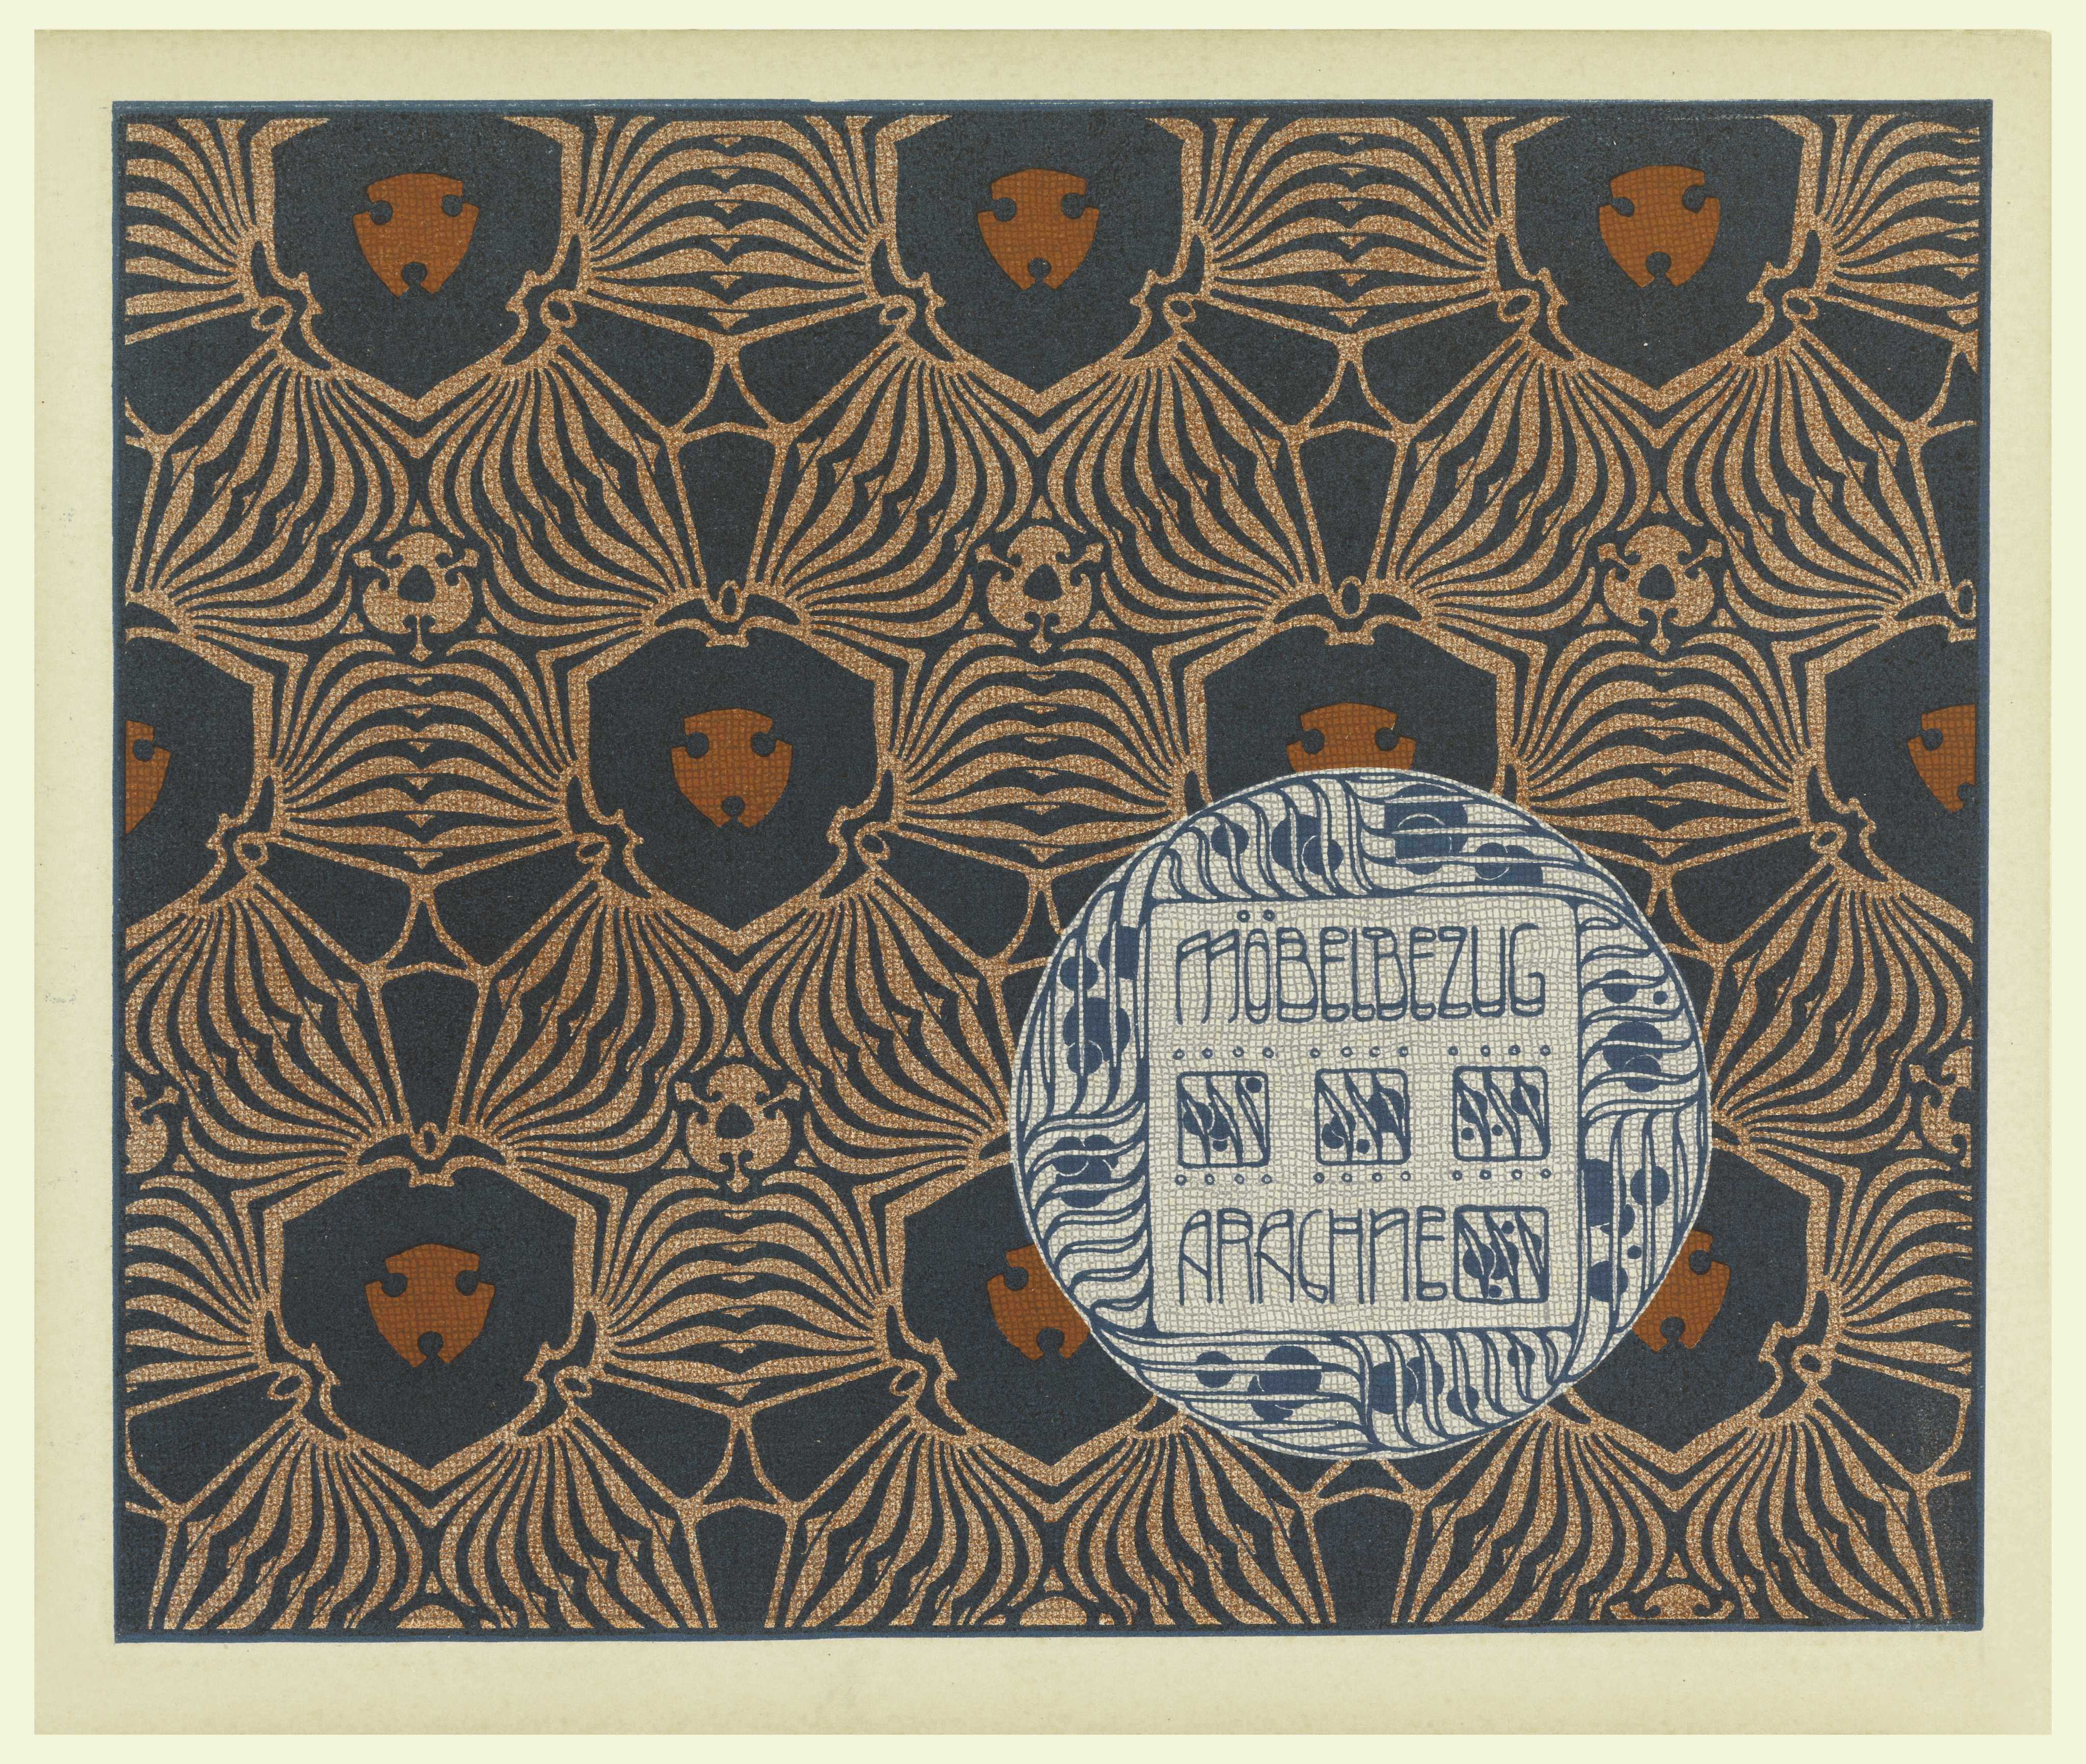 File Print Mobelbezug Arachne Upholstery Fabric Plate 18 In